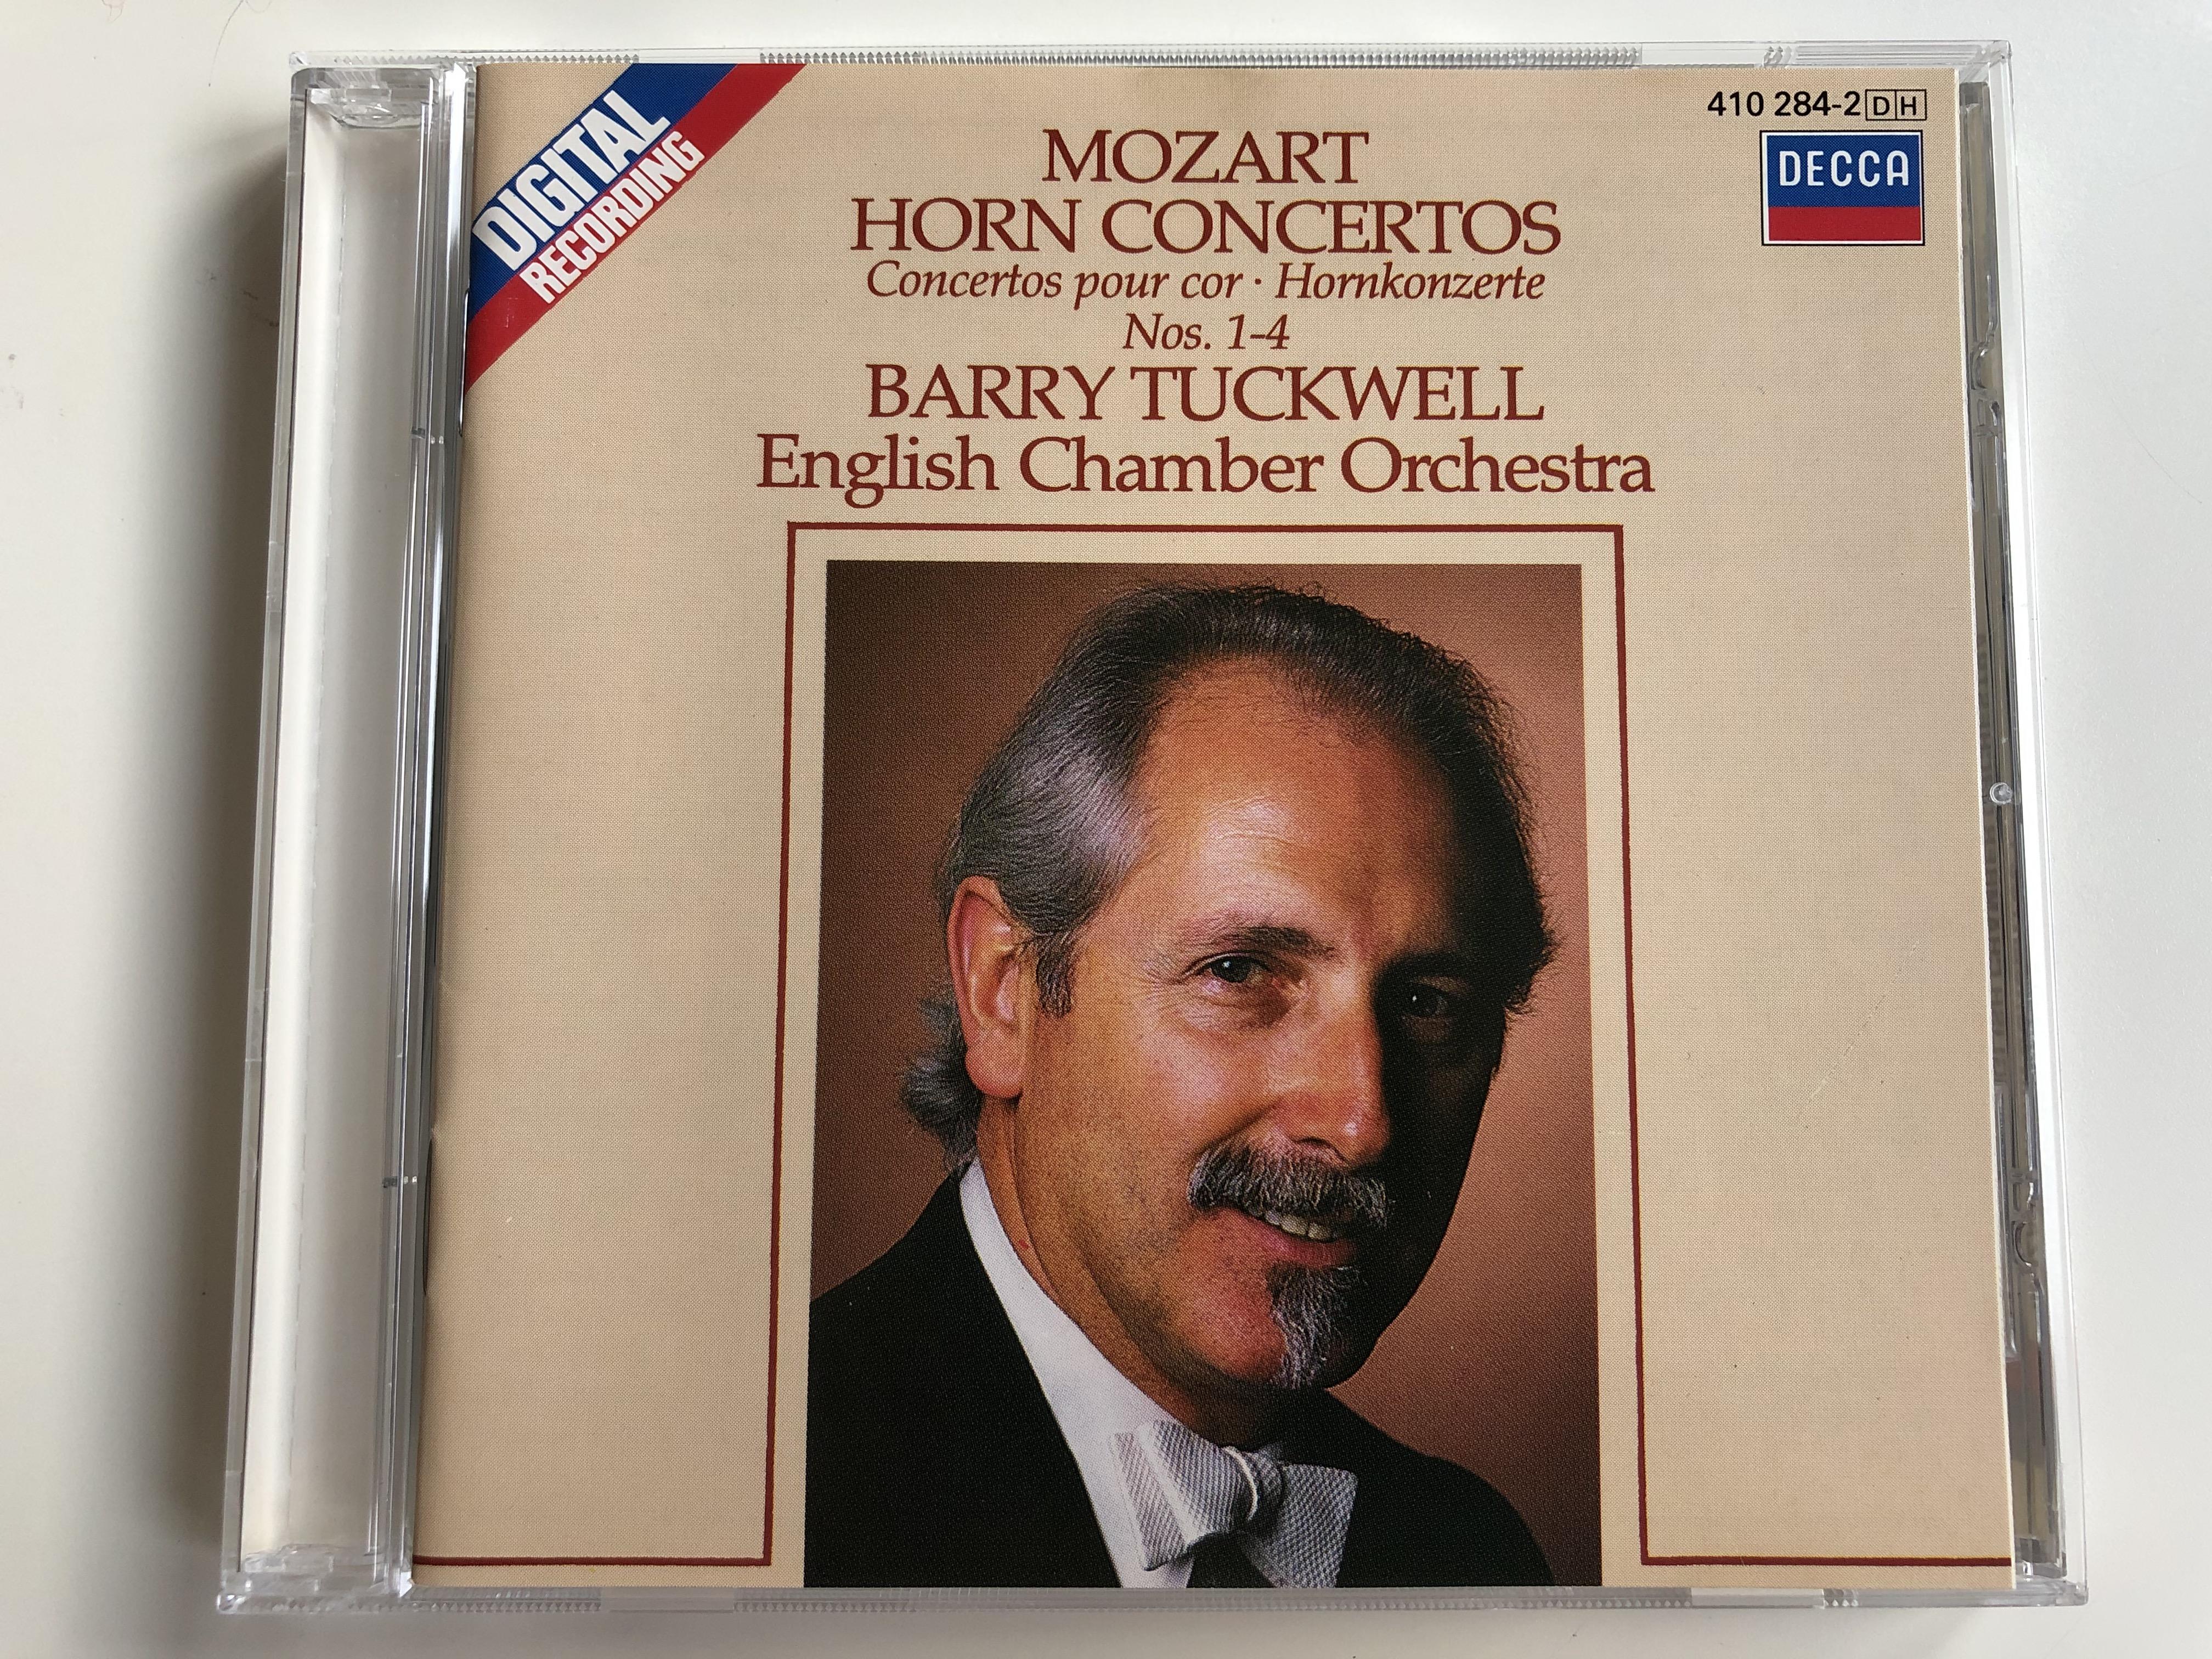 mozart-horn-concertos-concertos-pour-cor-hornkonzerte-nos.-1-4-barry-tuckwell-english-chamber-orchestra-decca-audio-cd-1984-stereo-410-284-2-1-.jpg